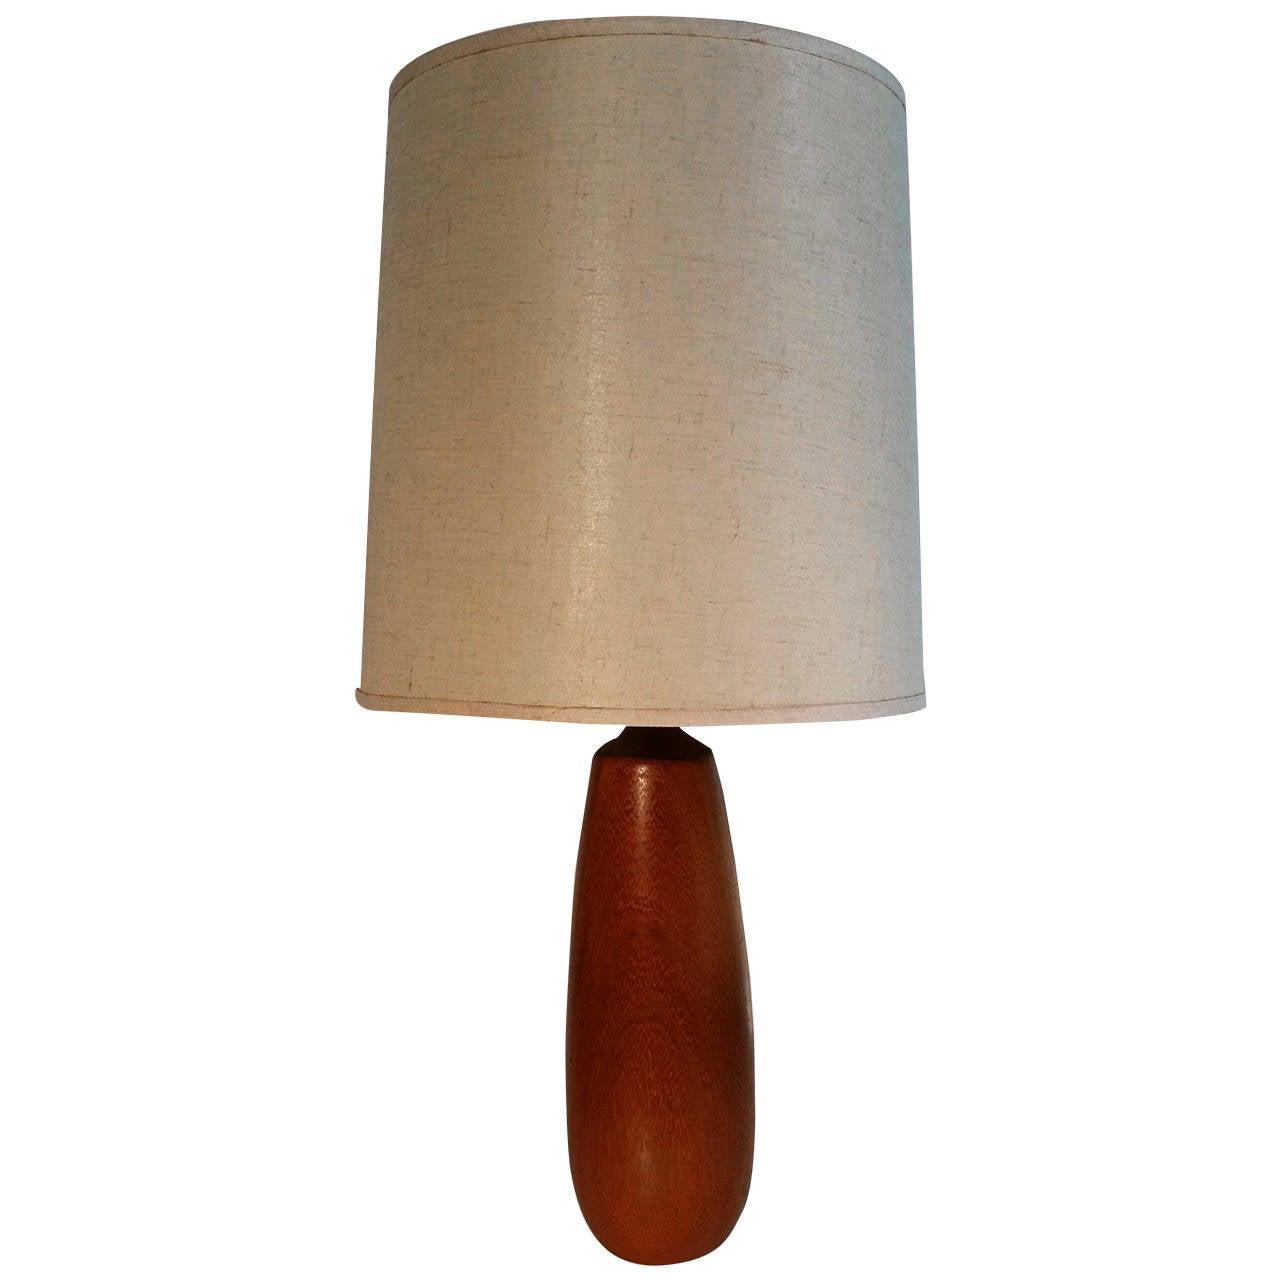 Danish Hand-Turned Teak Wood Modernist Lamp